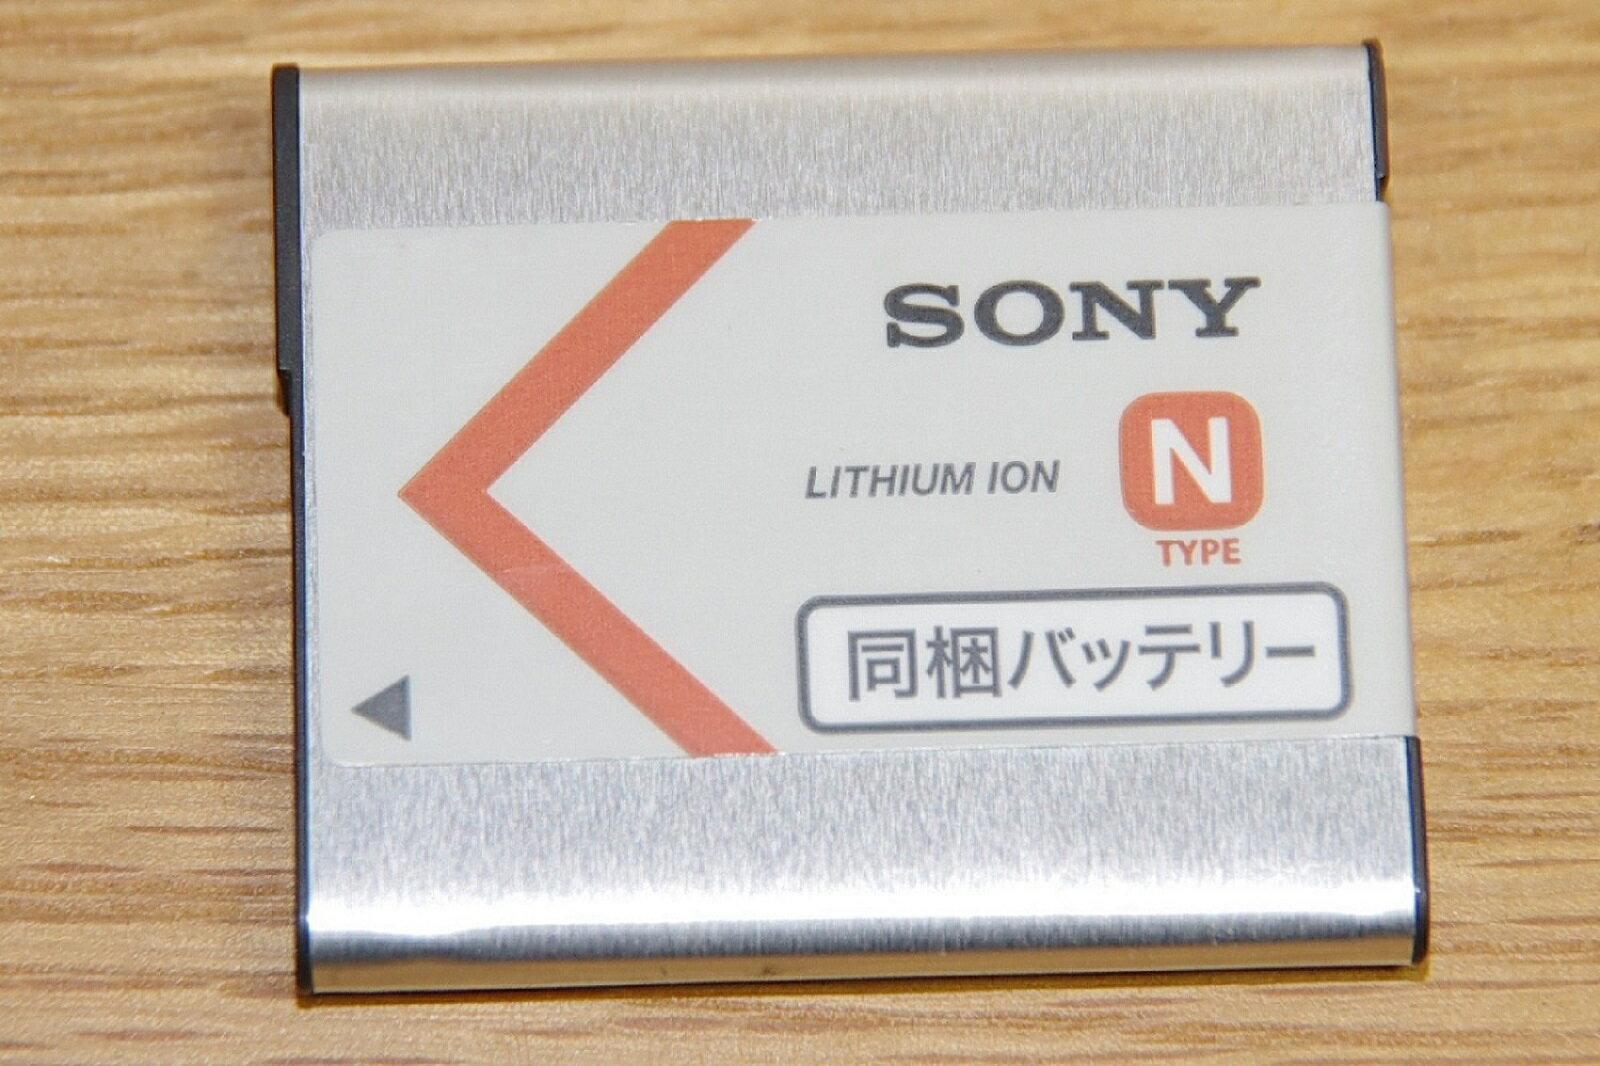 SONY ソニー純正 NP-BN リチャージャブルバッテリーパック 同梱品   DSC-WX70など 送料無料・あす楽対応【メール便】充電池